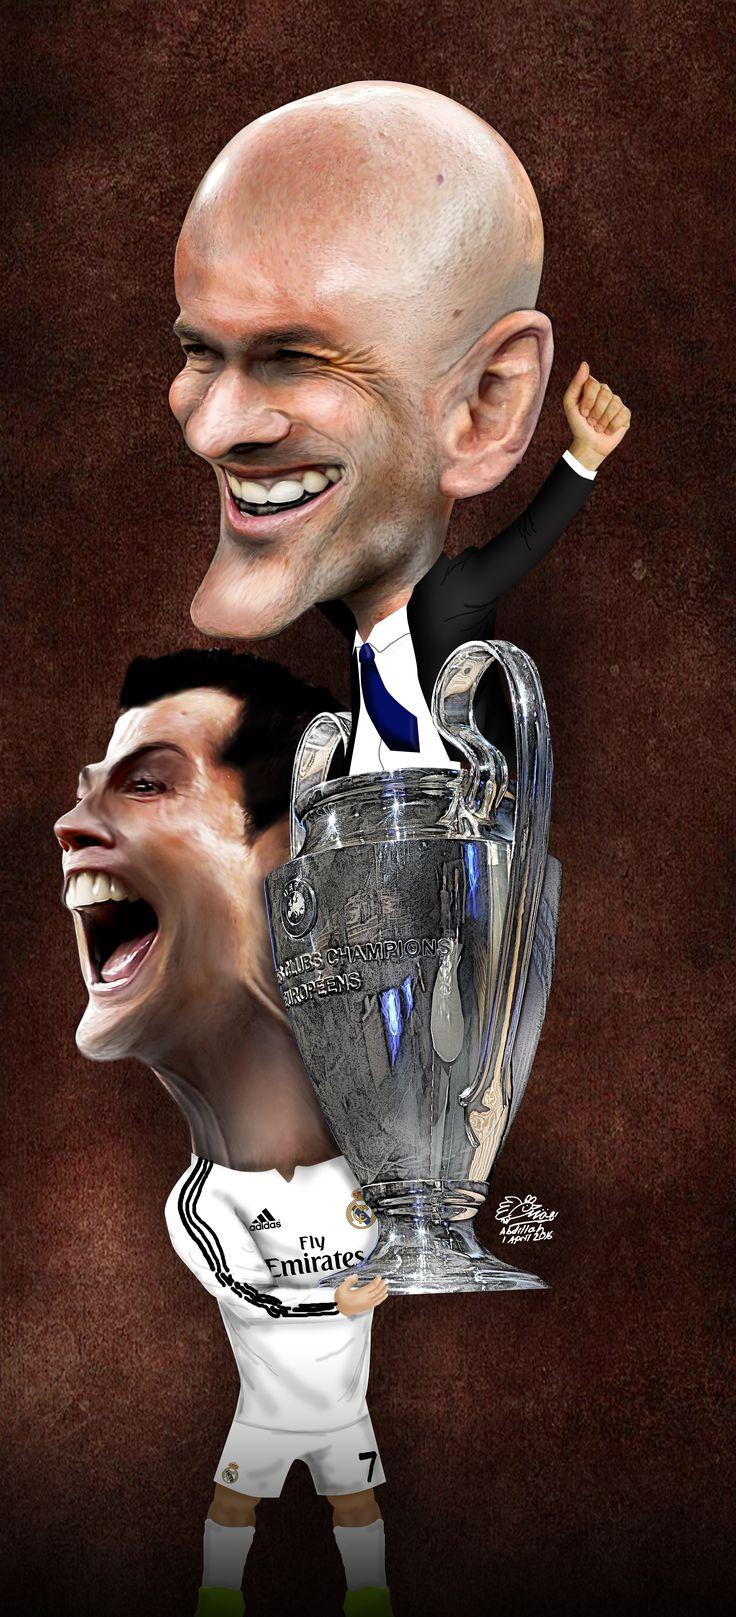 Real Madrid Juara Liga Champions 2015/2016 (Design: Abdillah)